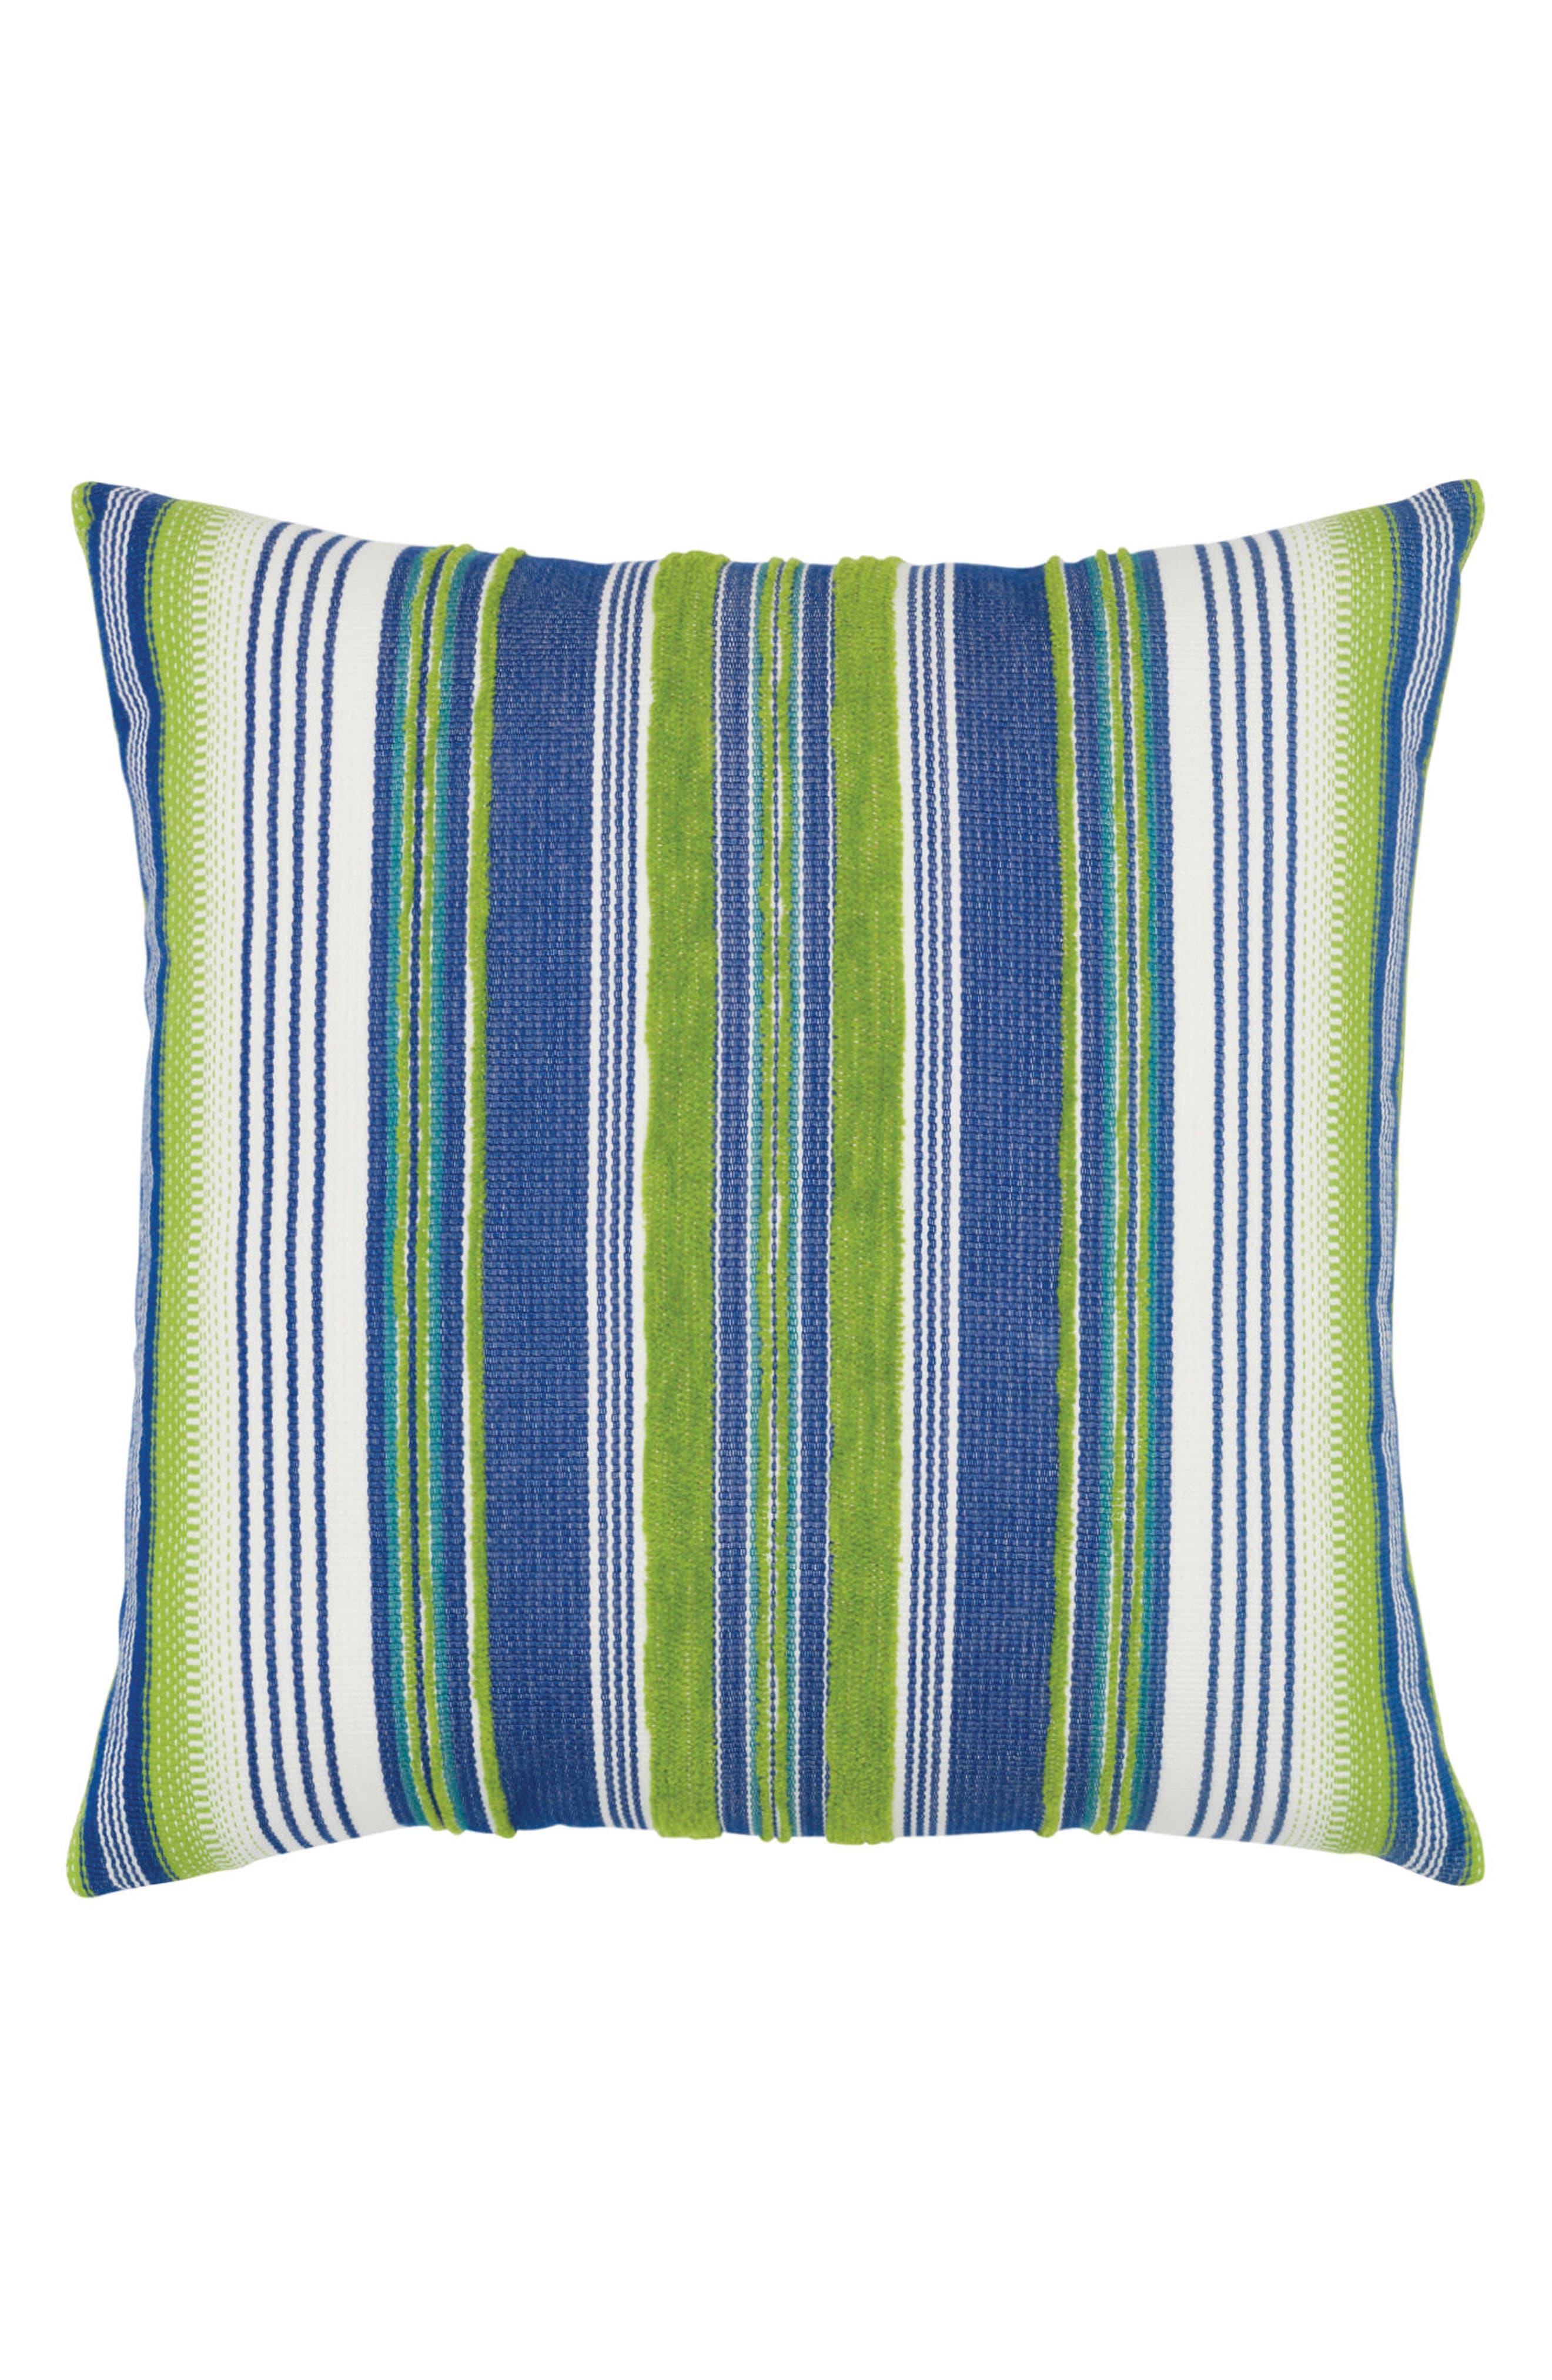 Deep Sea Stripe Indoor/Outdoor Accent Pillow,                         Main,                         color, Blue/ Green